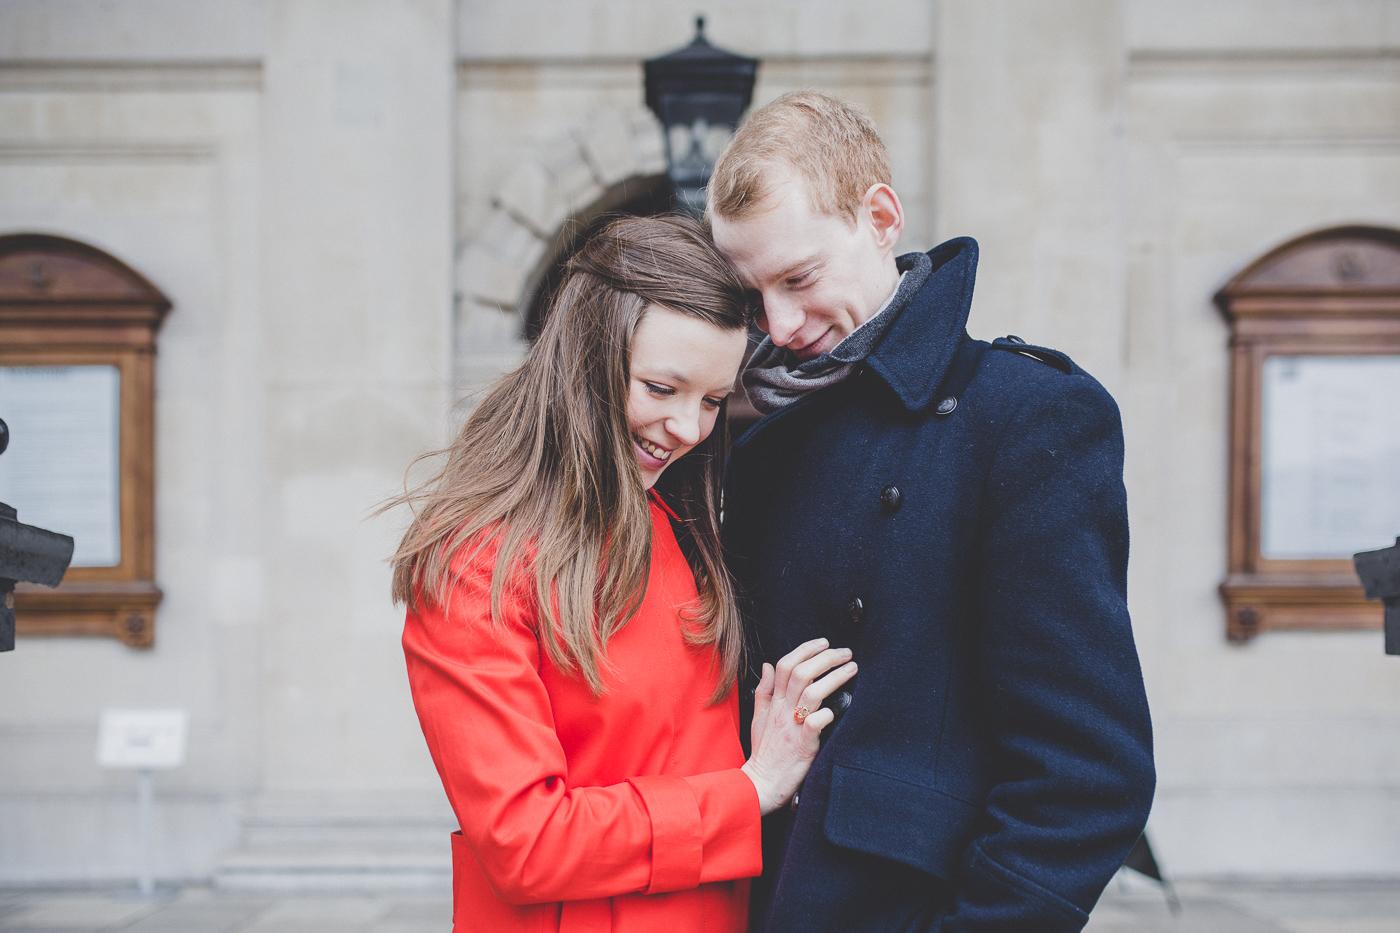 london-wedding-photographer-kate-gray-2.jpg